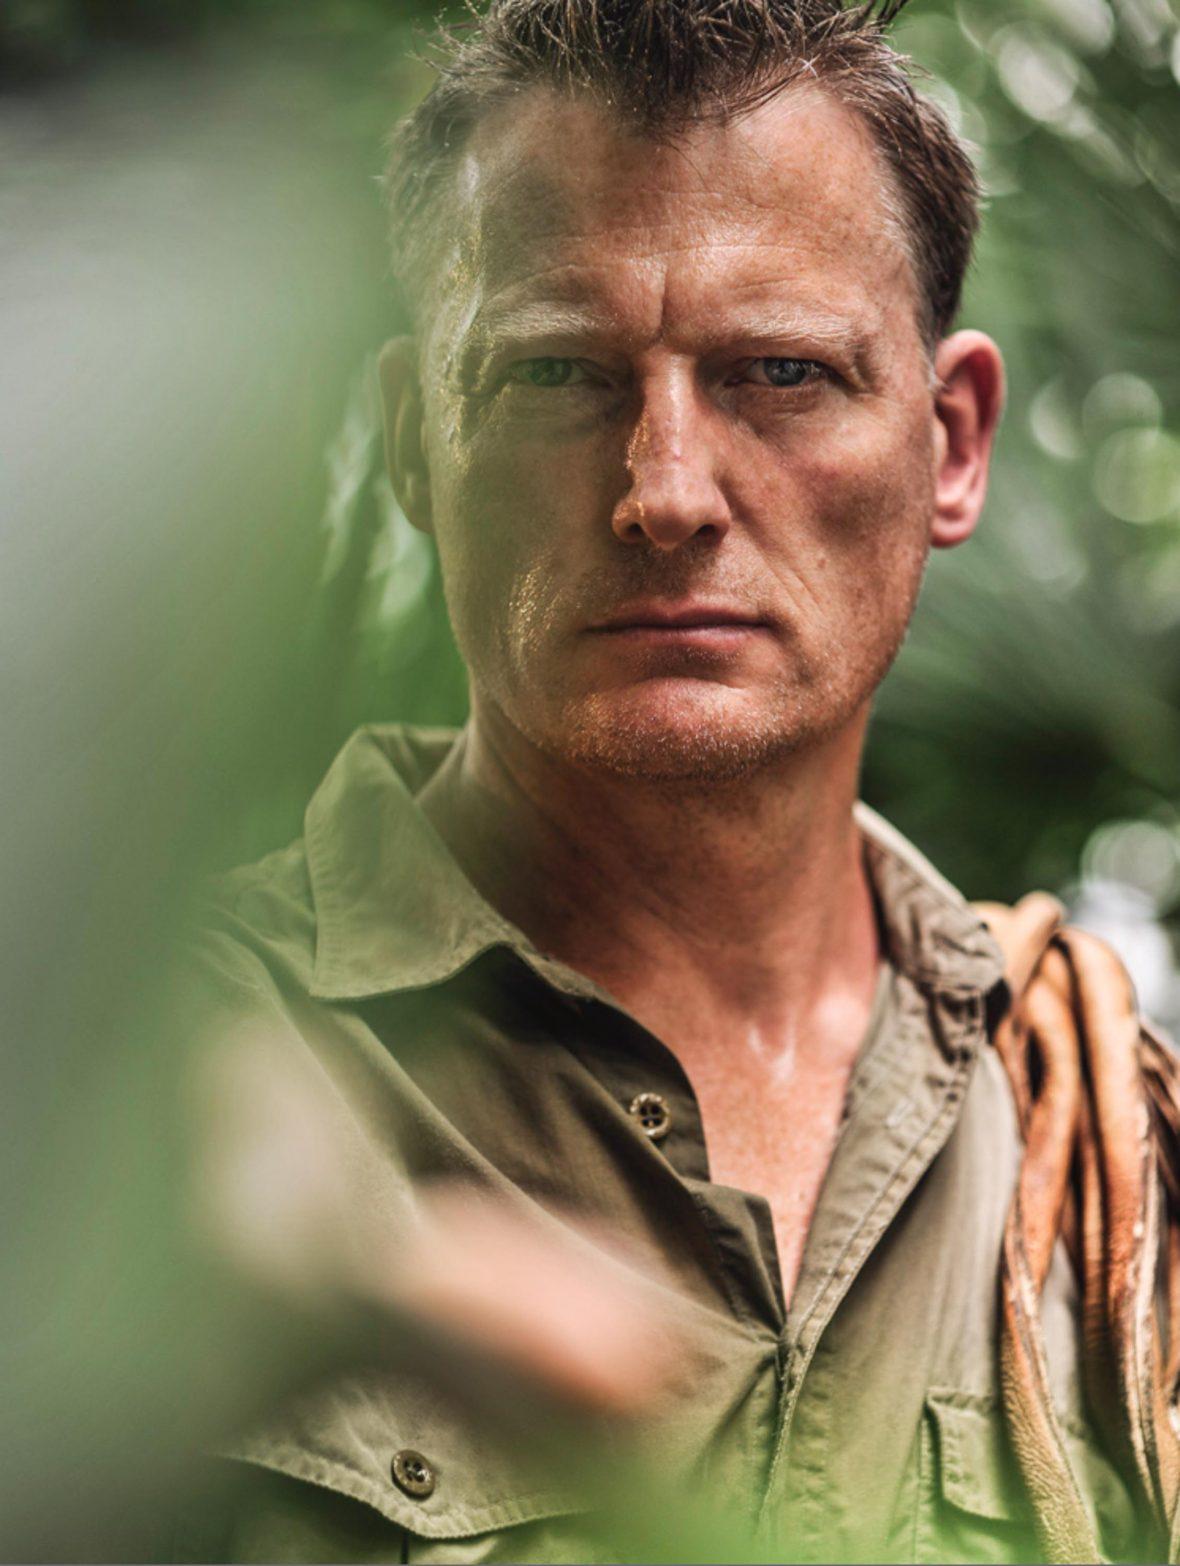 Explorer, writer, speaker and environmentalist Benedict Allen.